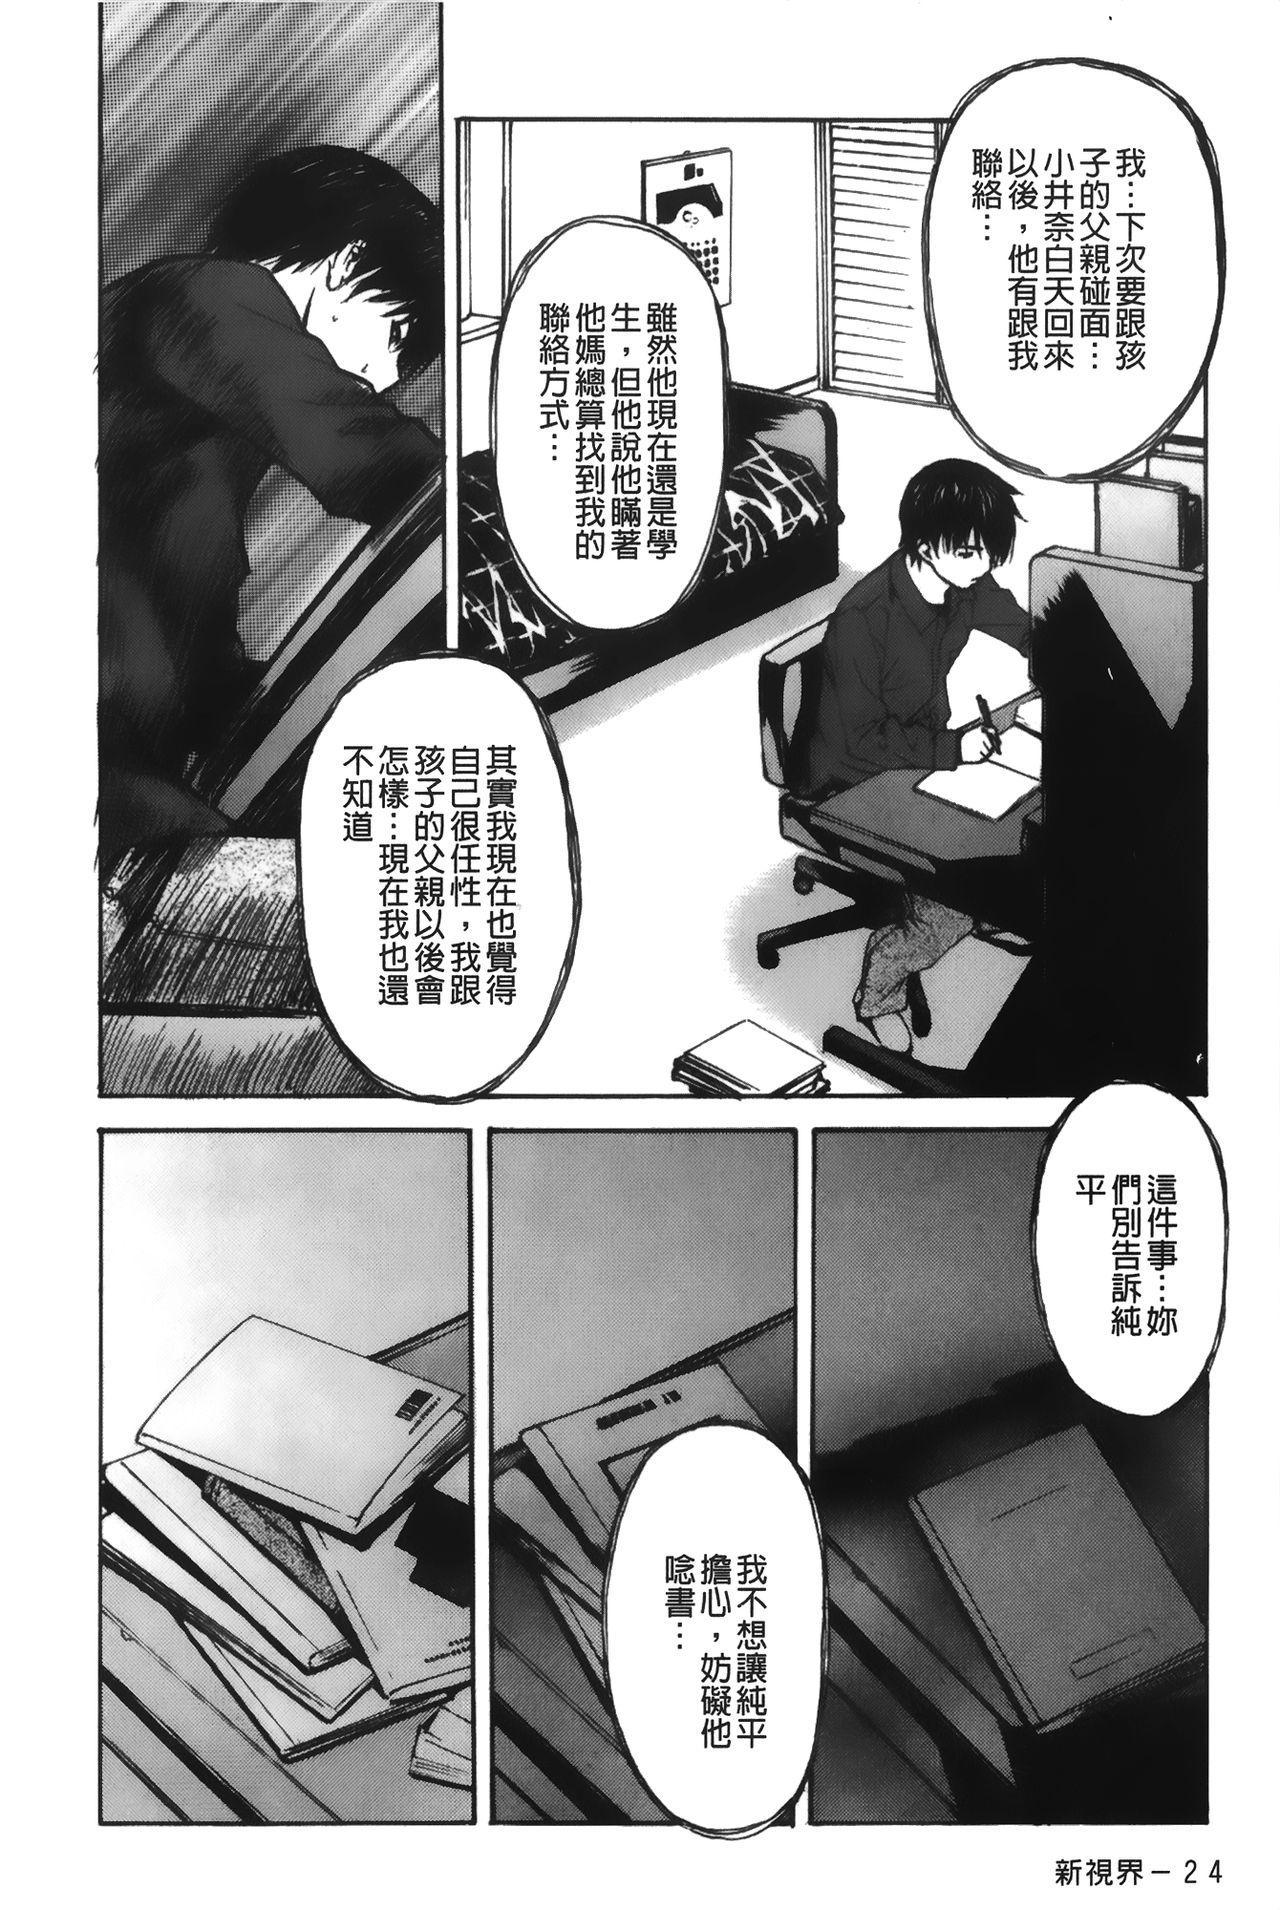 Tonari no Minano Sensei 4 | 隔壁的美奈乃老師 4 191